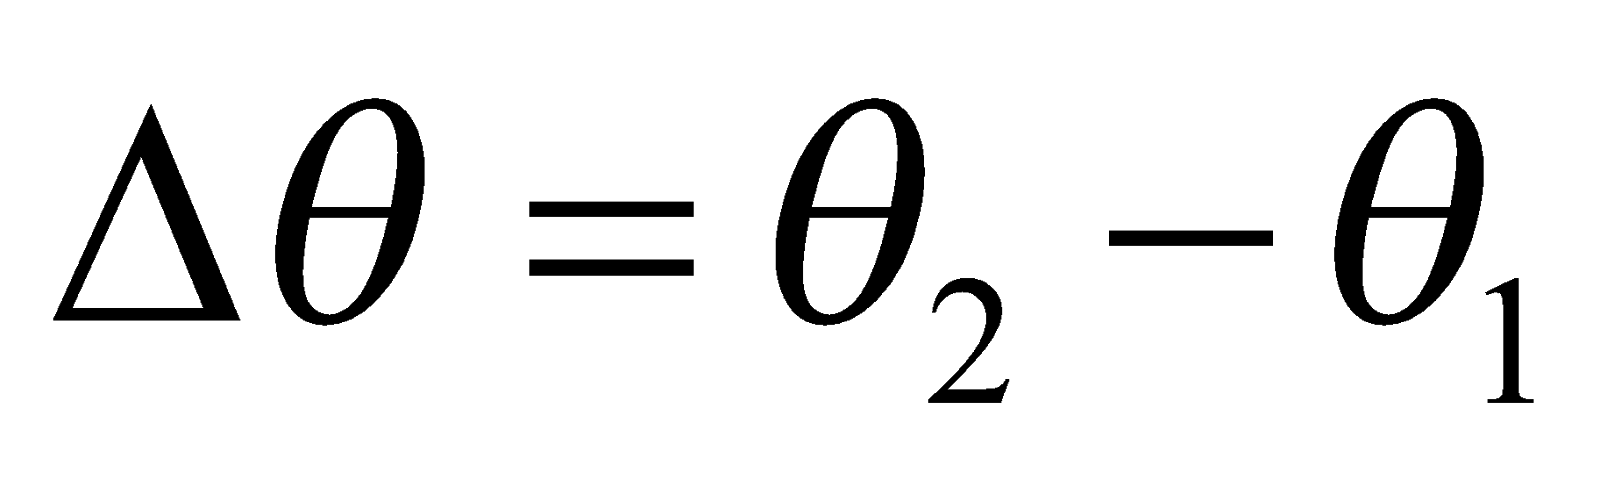 Angular displacement Formulas